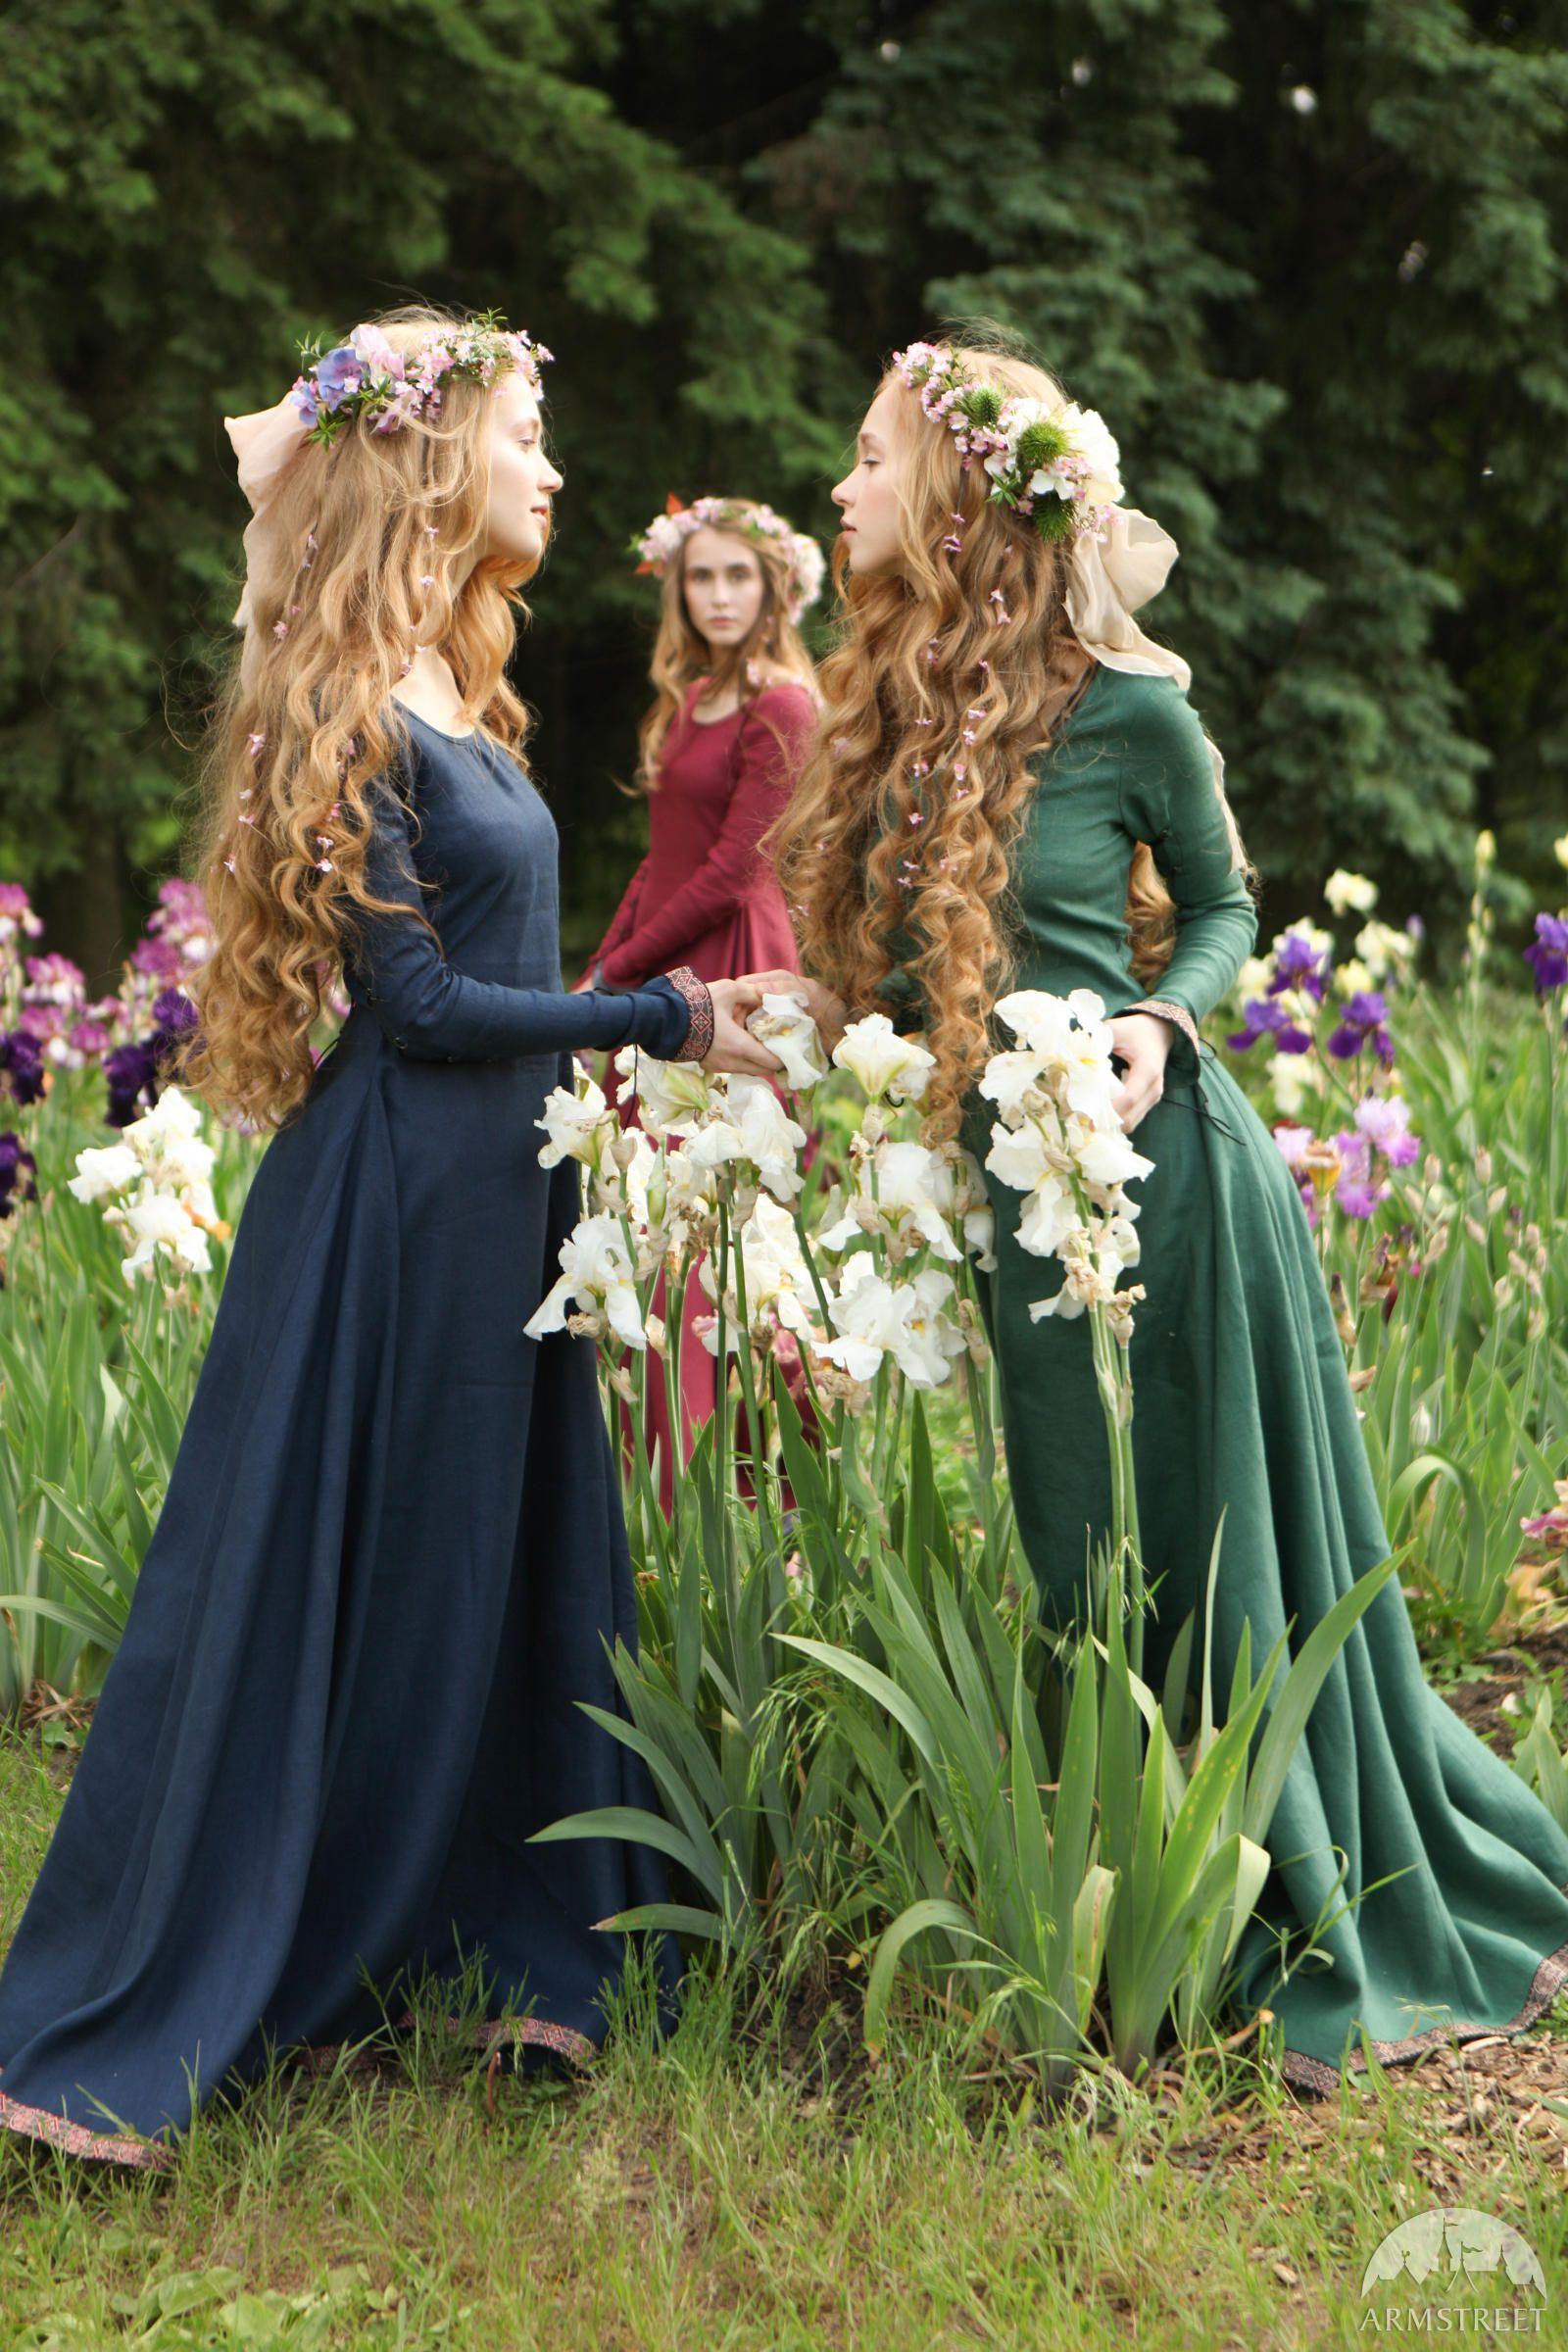 Lofi, Sifron, and Alid scheming Bridesmaid gown, Secret